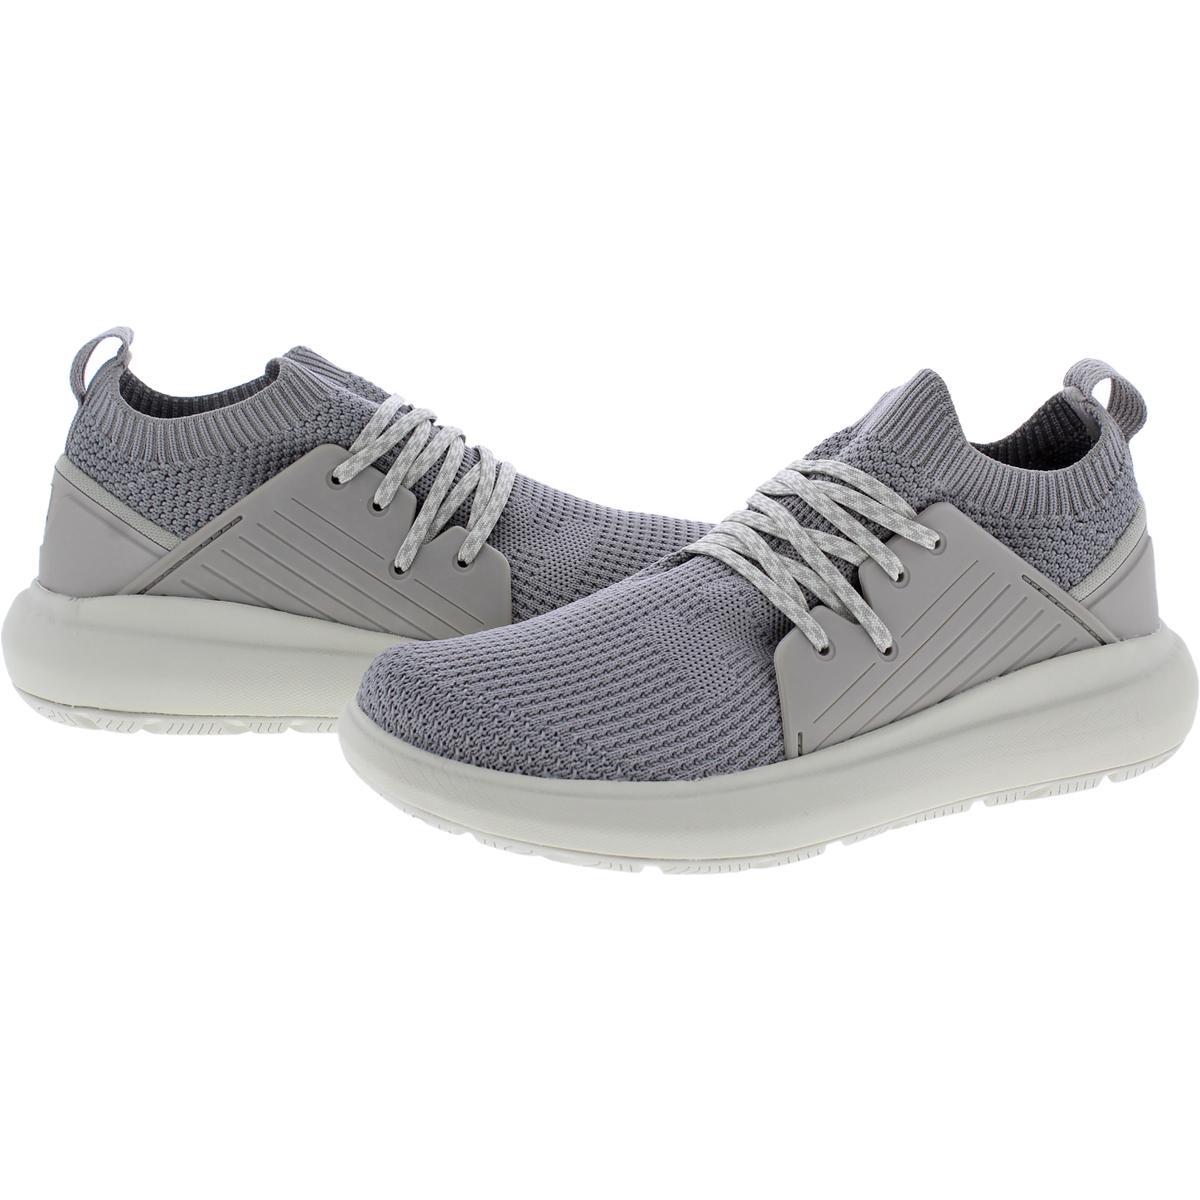 thumbnail 9 - Helly-Hansen-Womens-Razorskiff-Knit-Breathable-Fashion-Sneakers-Shoes-BHFO-8932